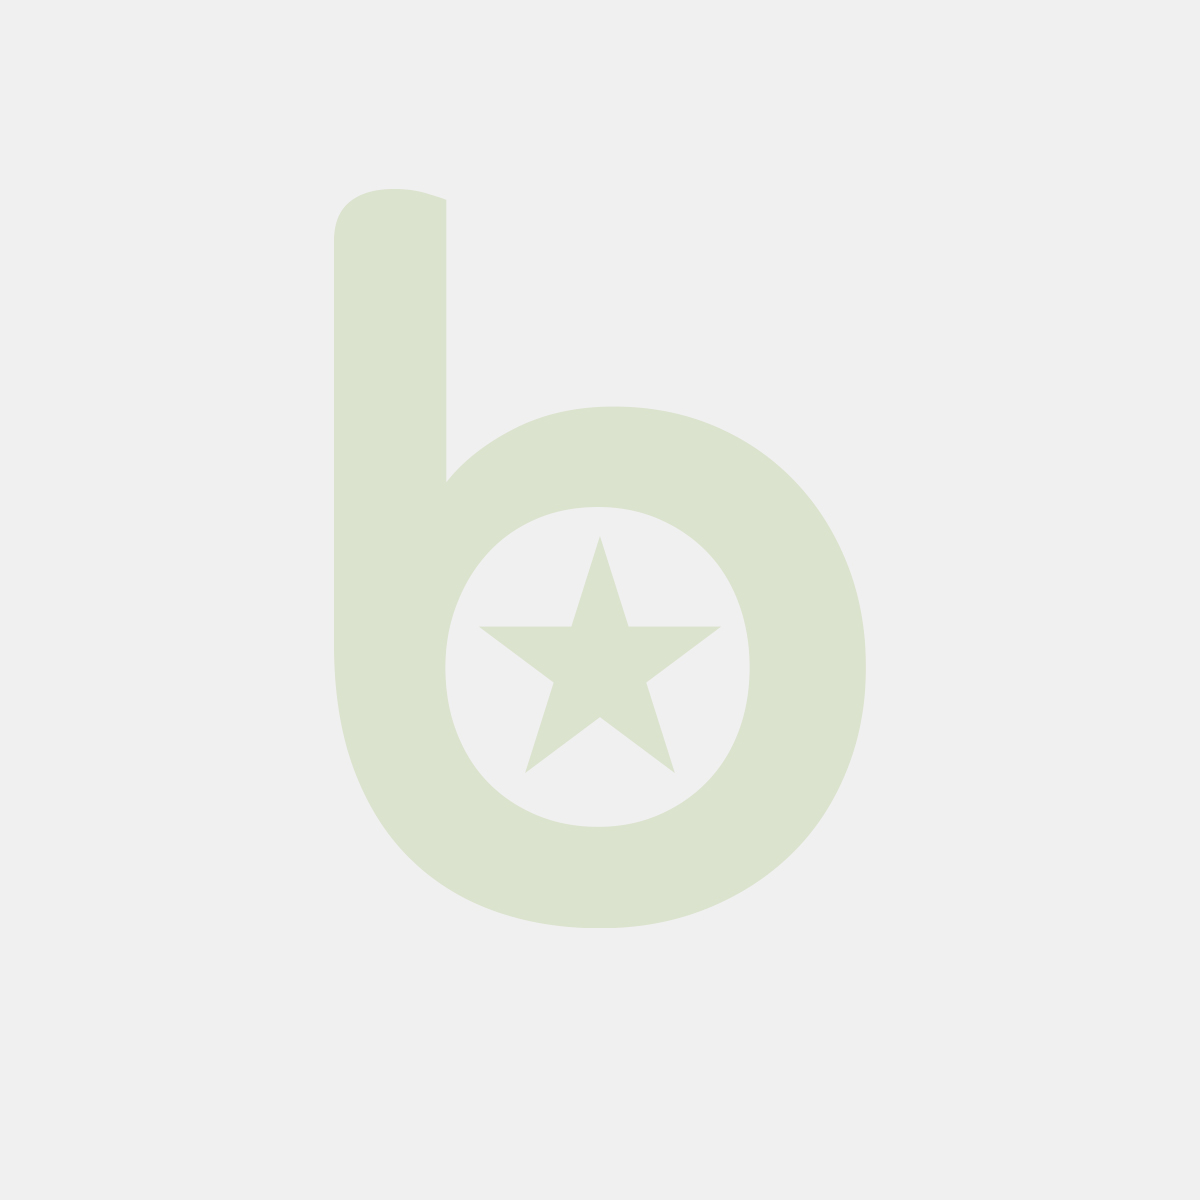 Reklamówki rolowane HDPE BARDZO GRUBE - GiGA 12 mikronów -280 szt